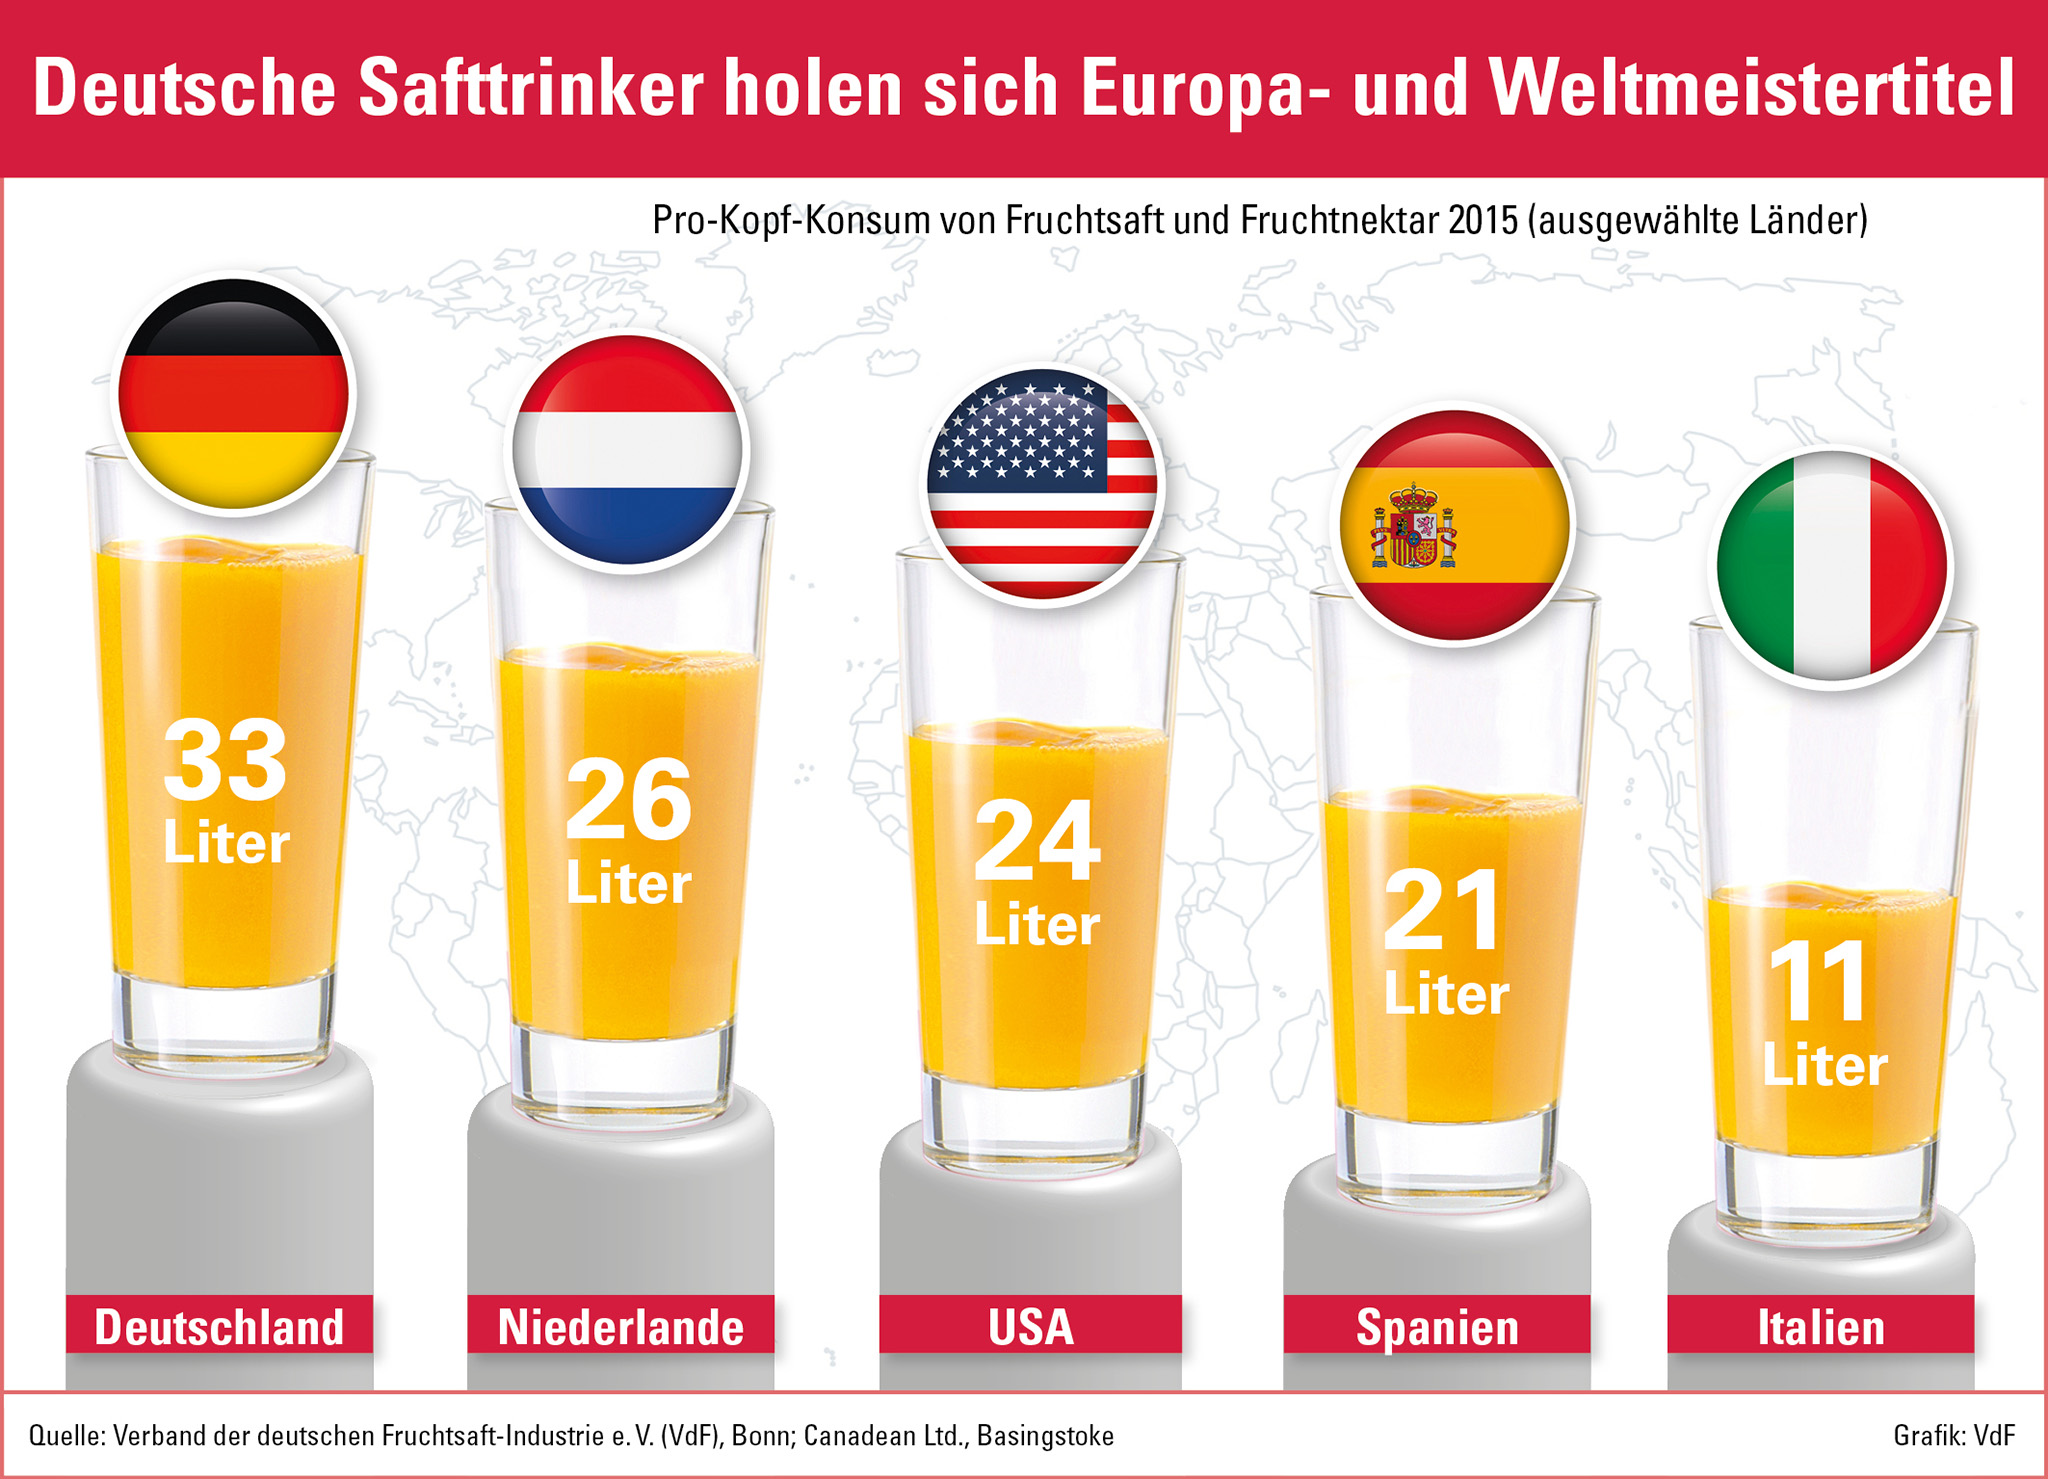 Deutsche Fruchtsaft-Industrie baut Spitzenposition aus